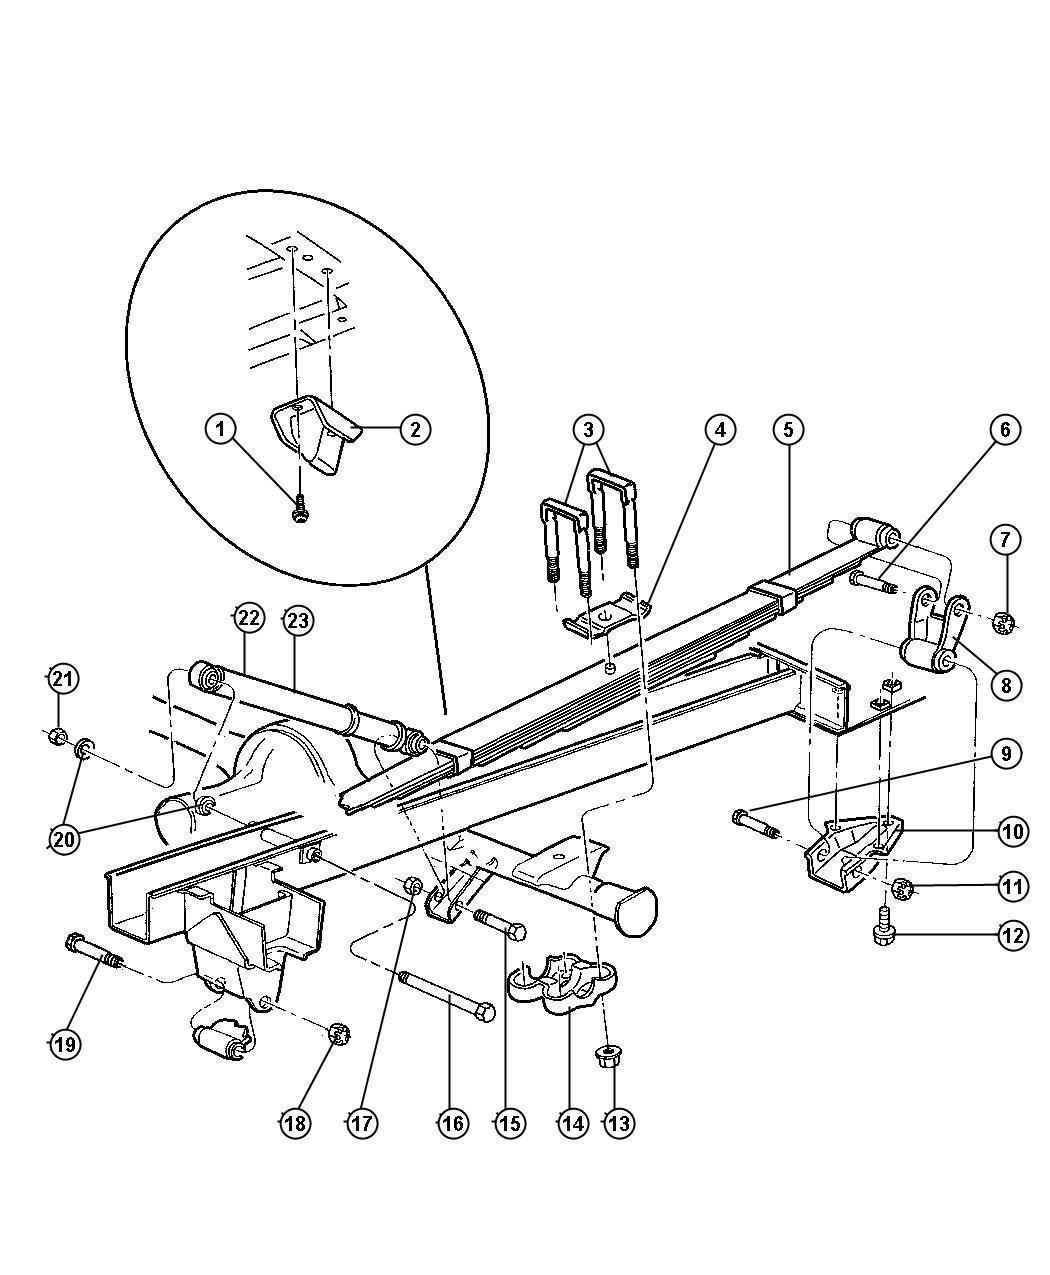 Dodge Ram Screw Pilot Point Truss Head M14x2